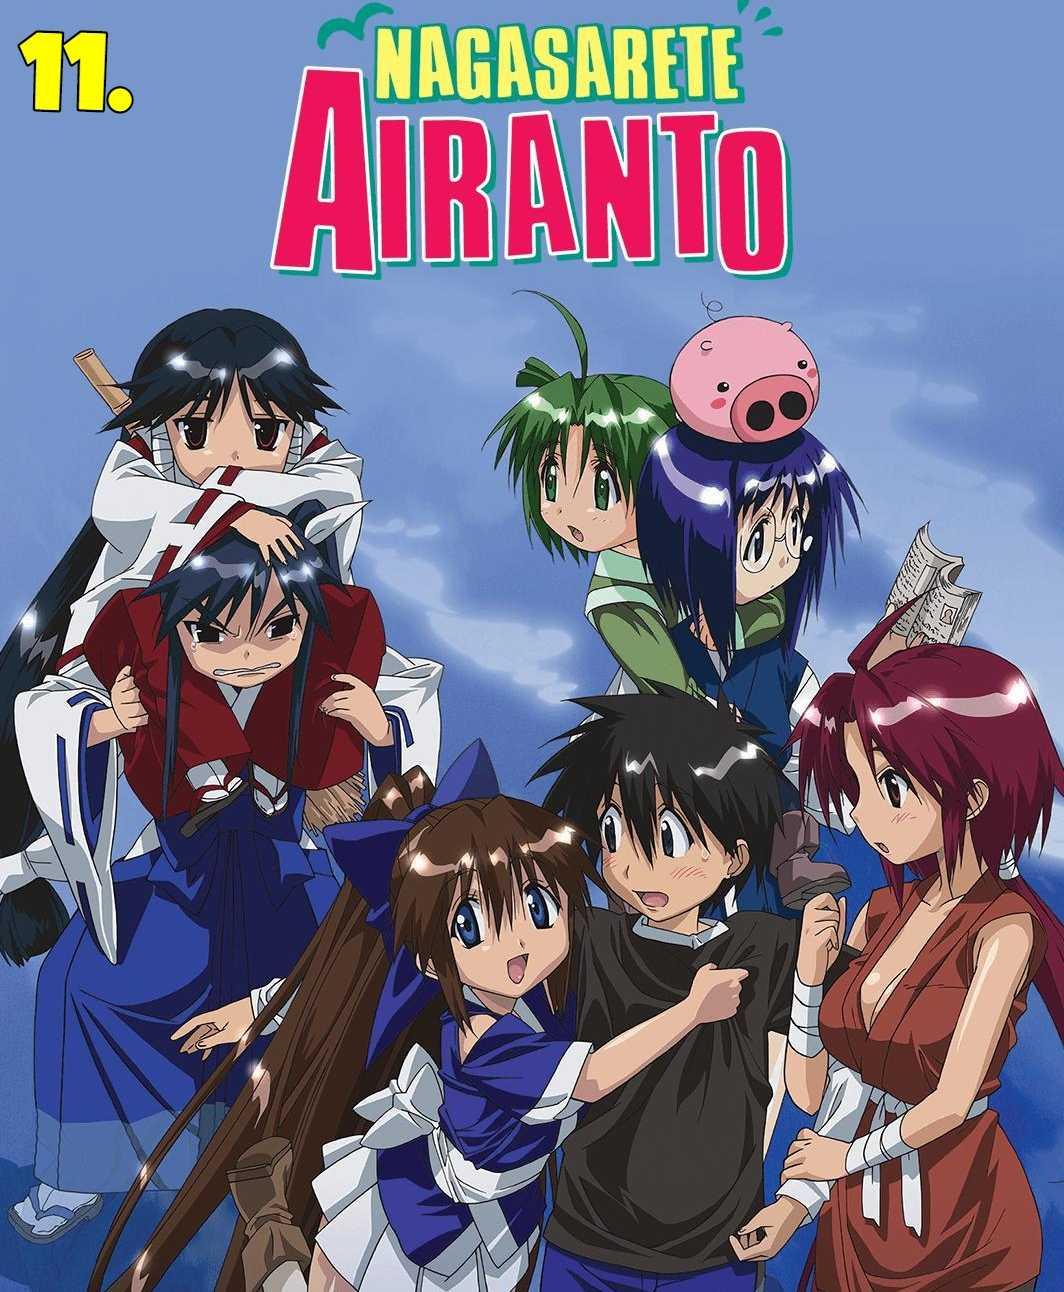 Nagasarete-Airantou